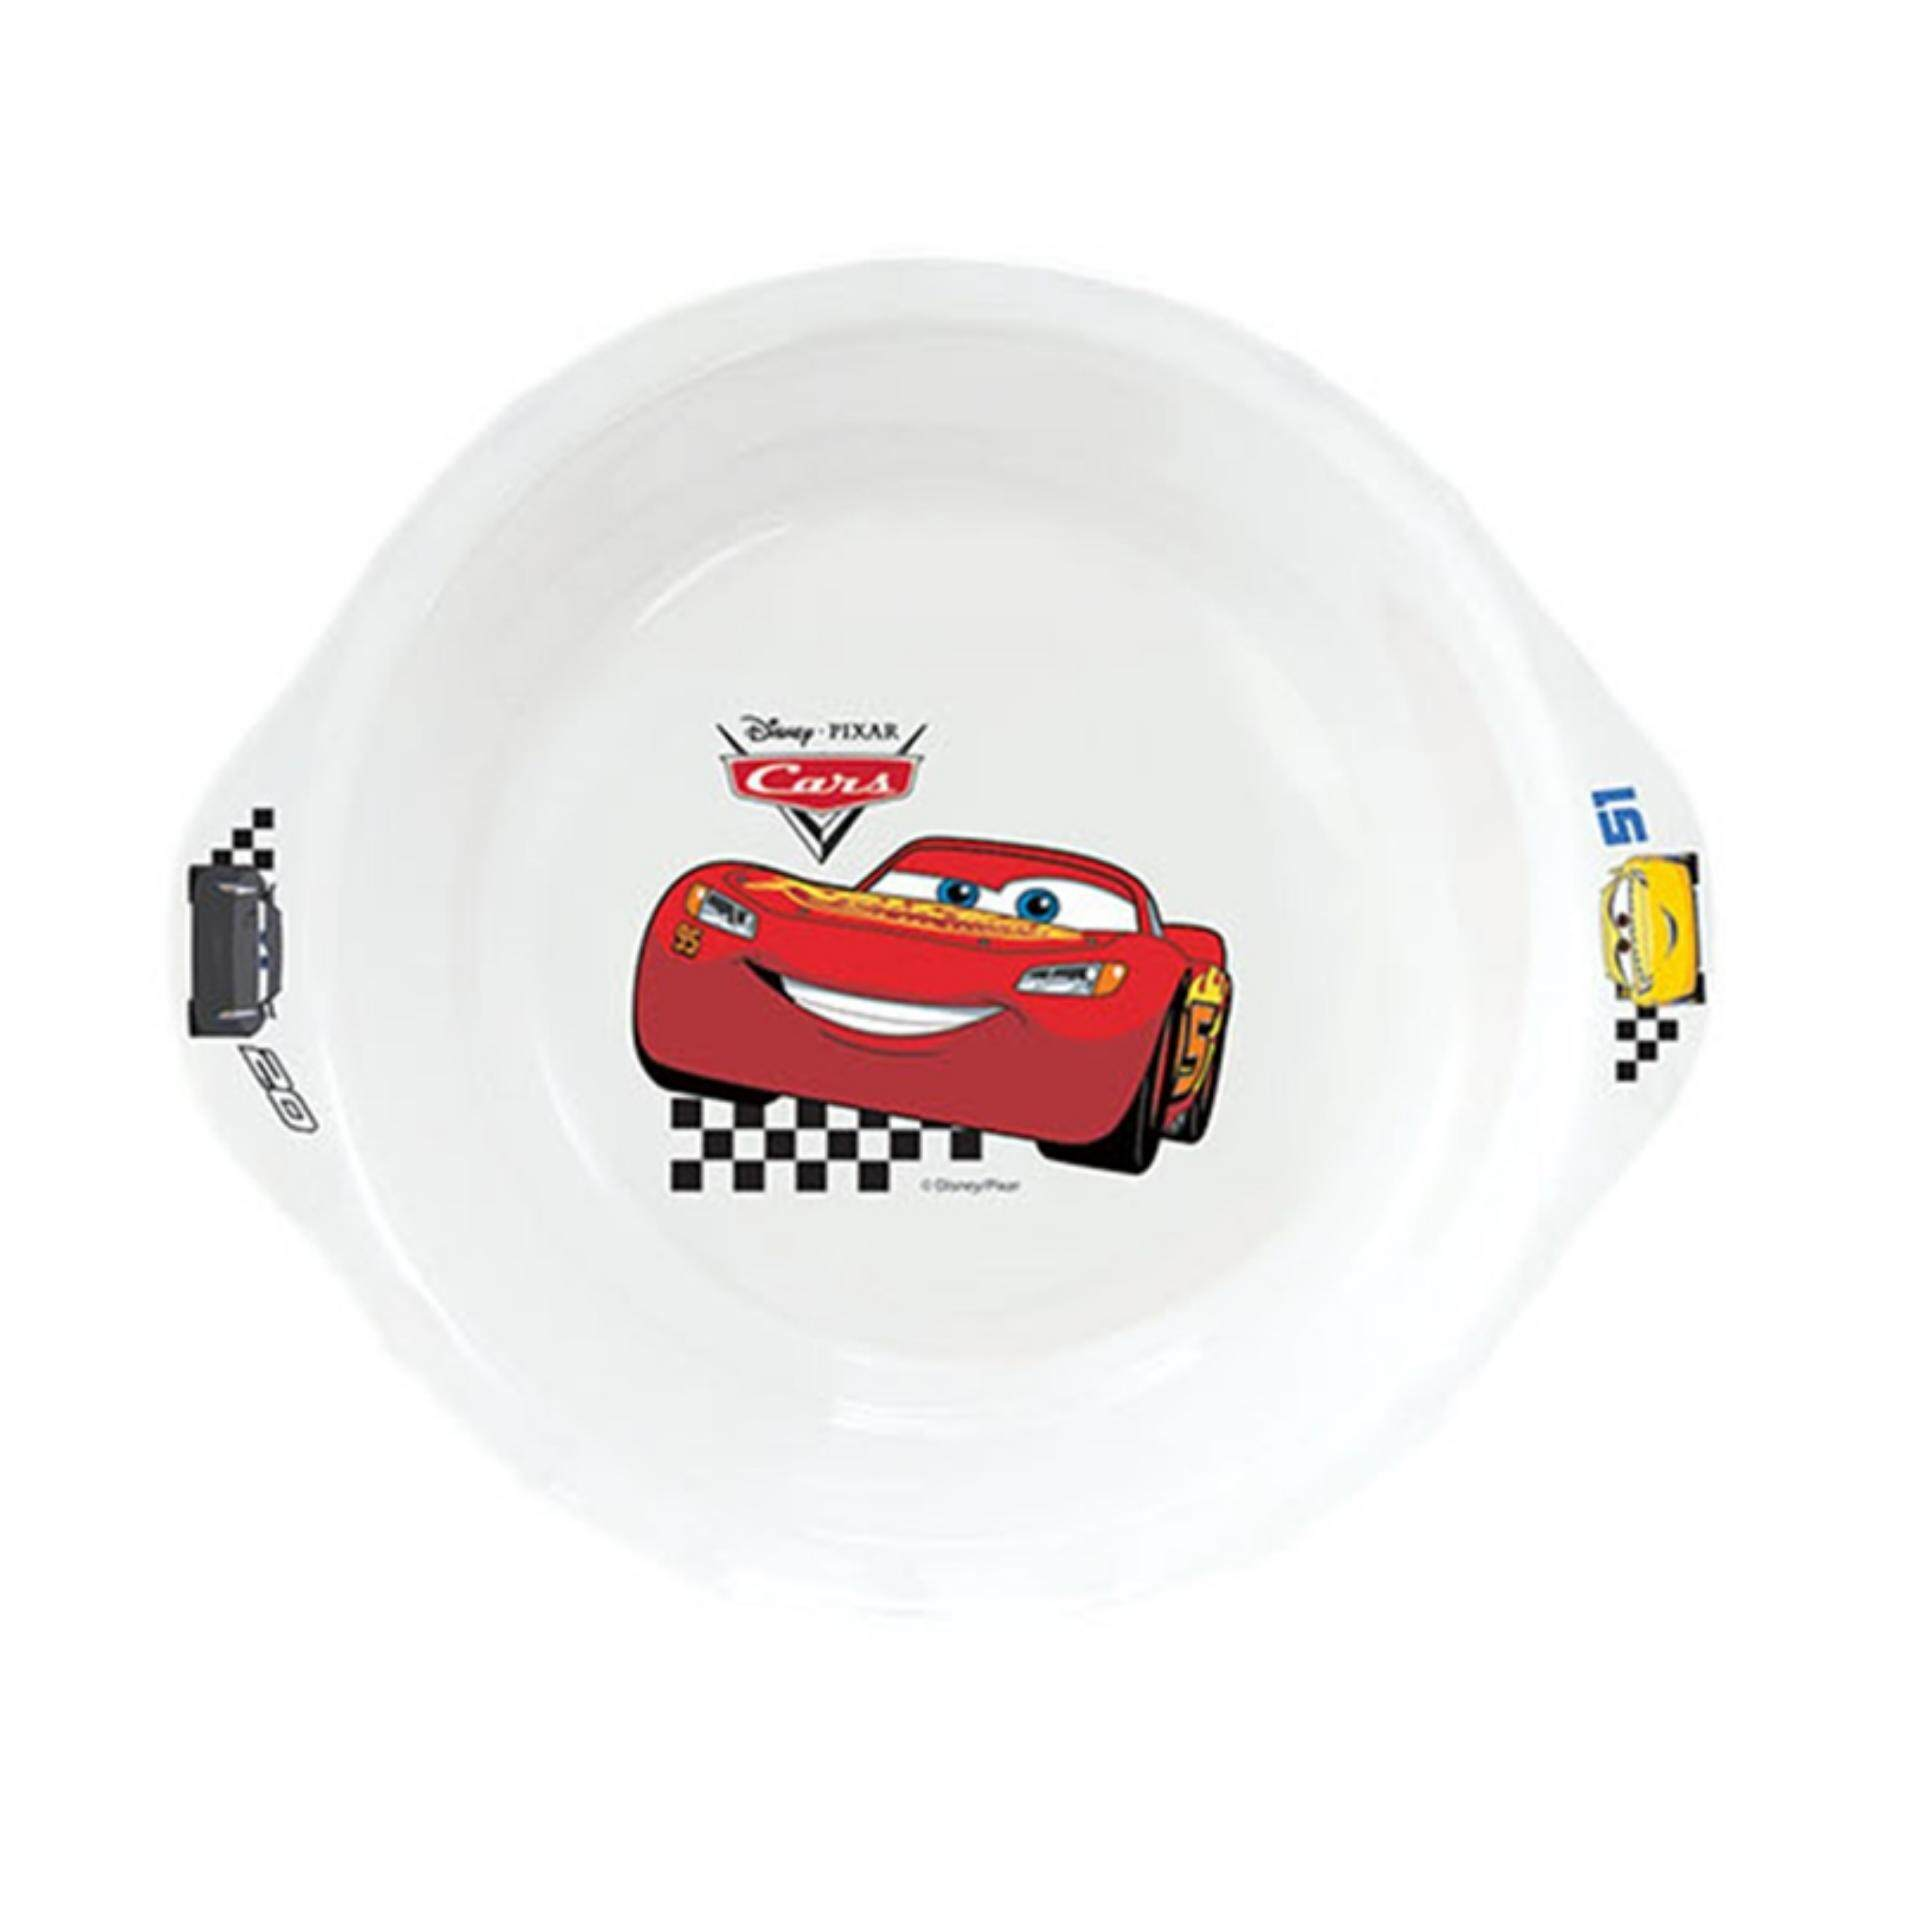 Disney Pixar Cars 3 Handle Bowl 6 Inches - White Colour